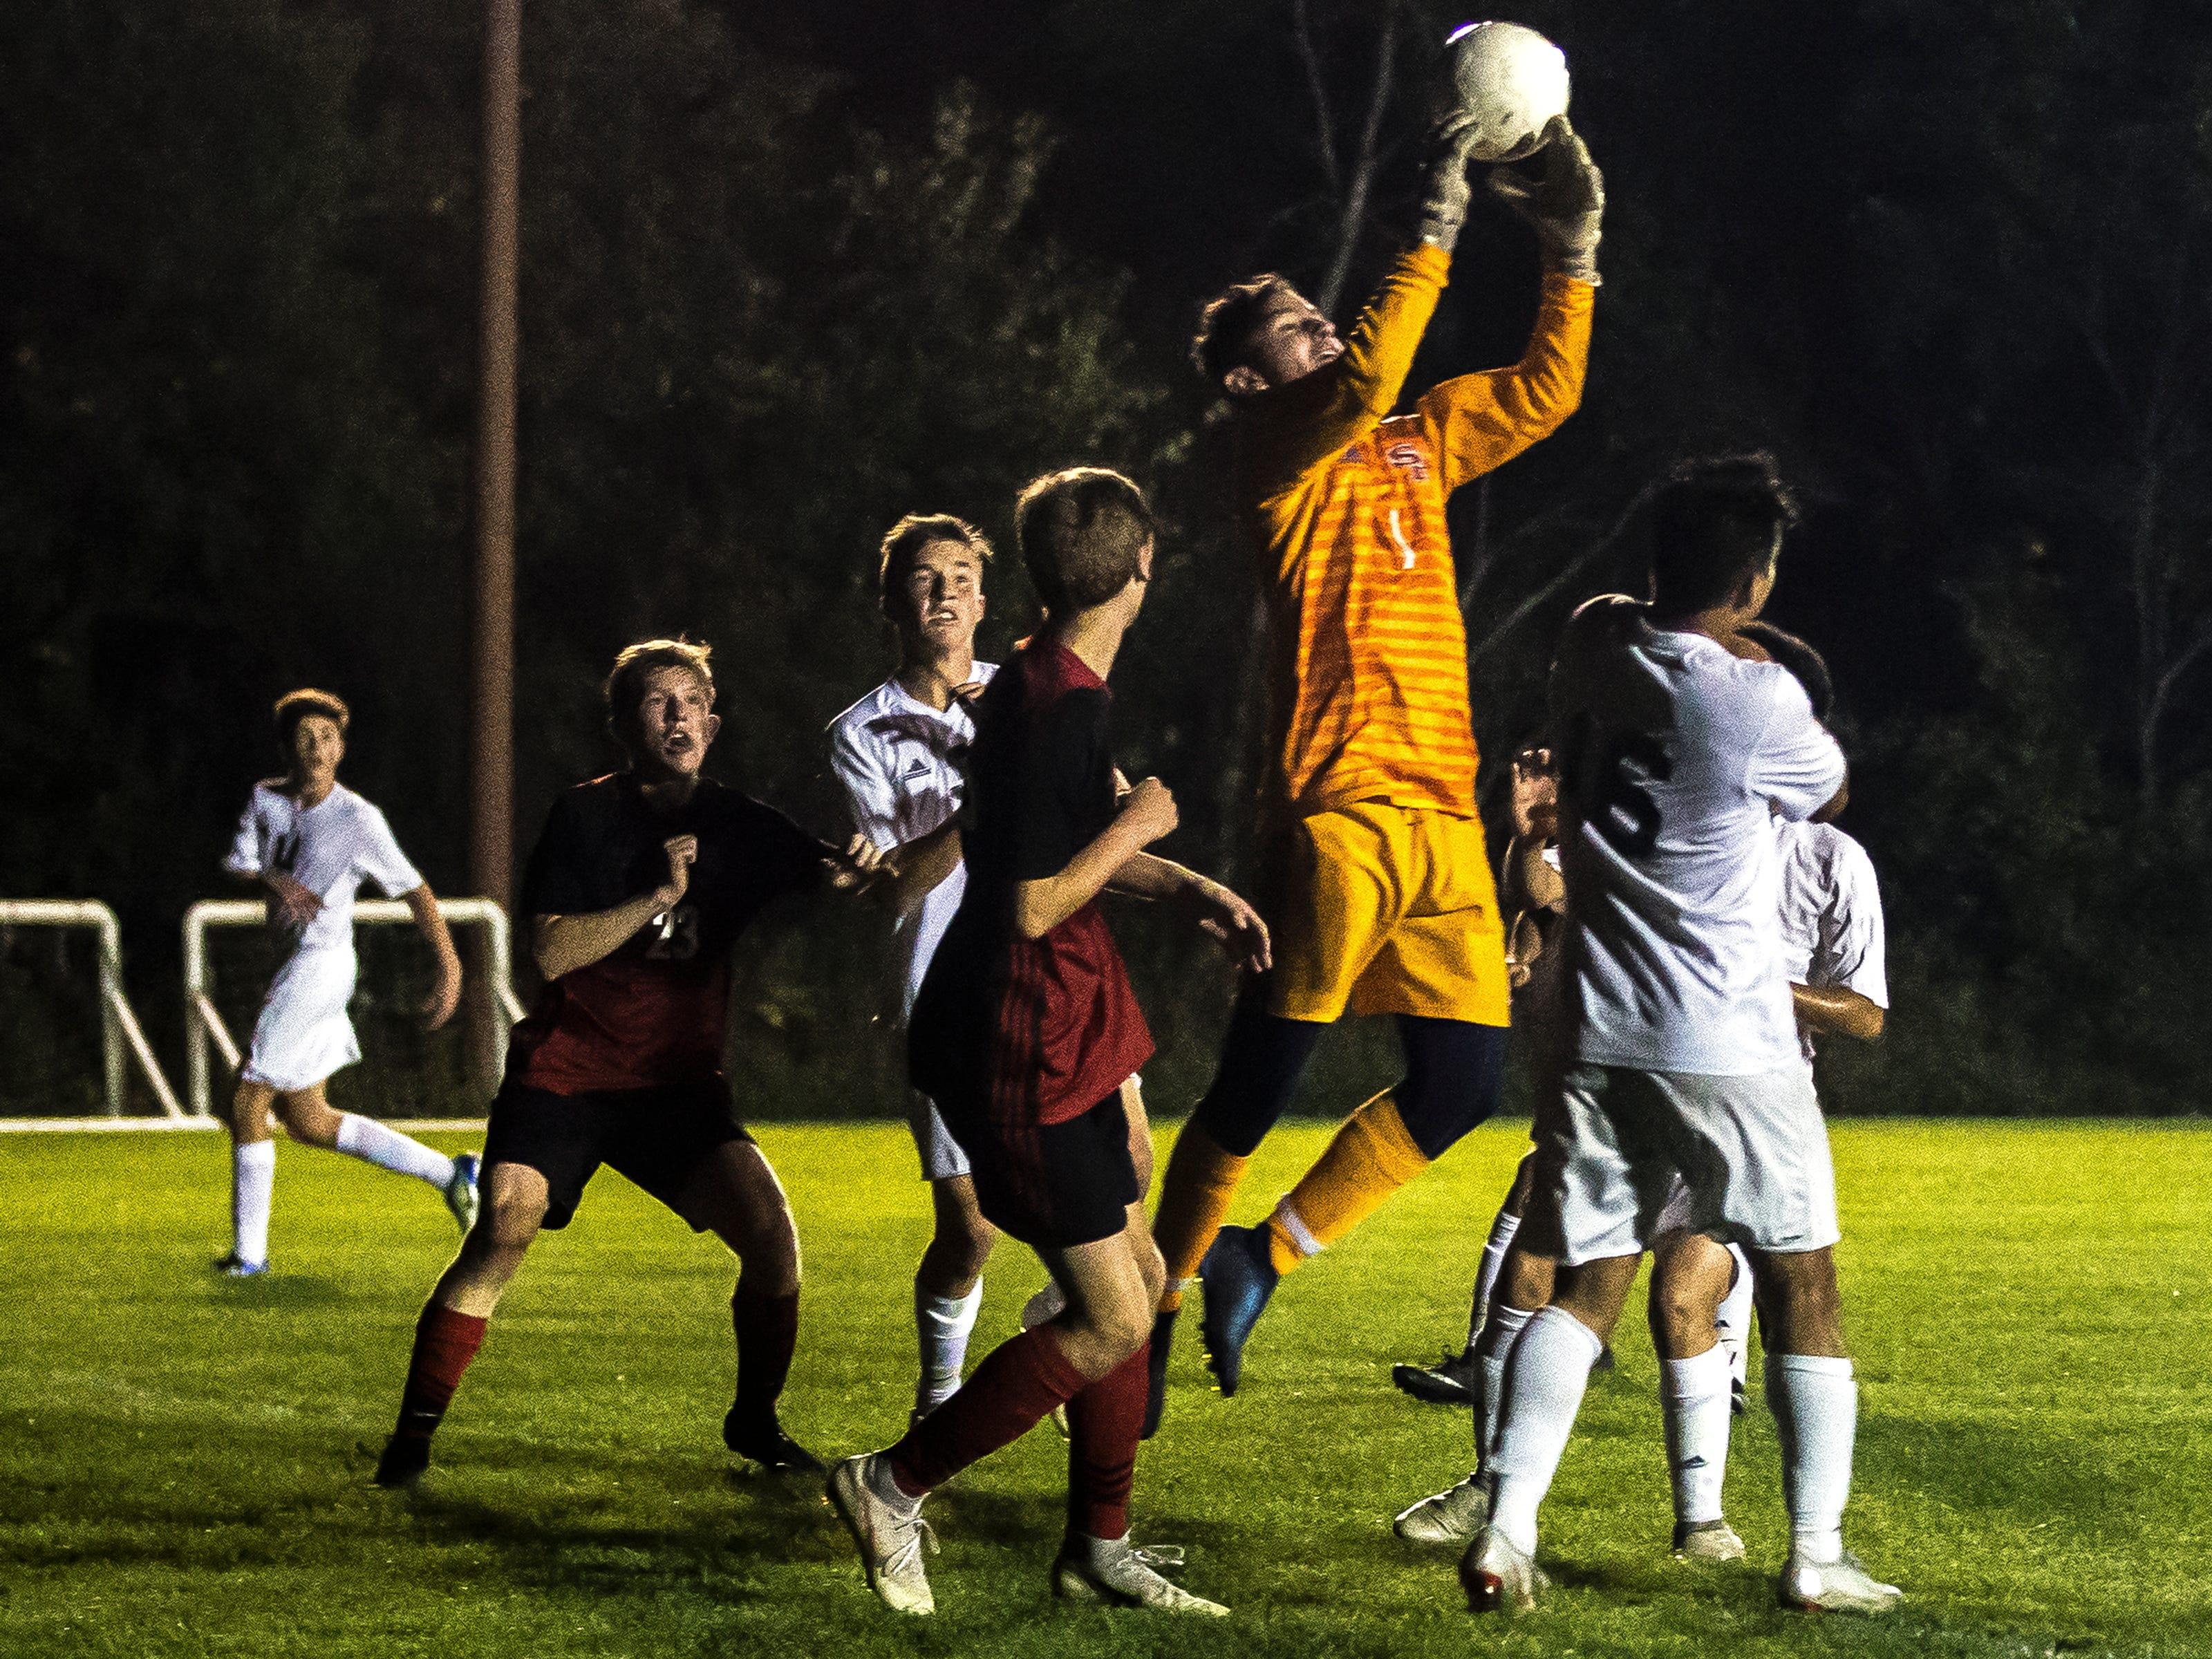 SPASH goalkeeper Spencer Banks makes a save during a soccer game between SPASH and D.C. Everest in Stevens Point, Wis., September 13, 2018.